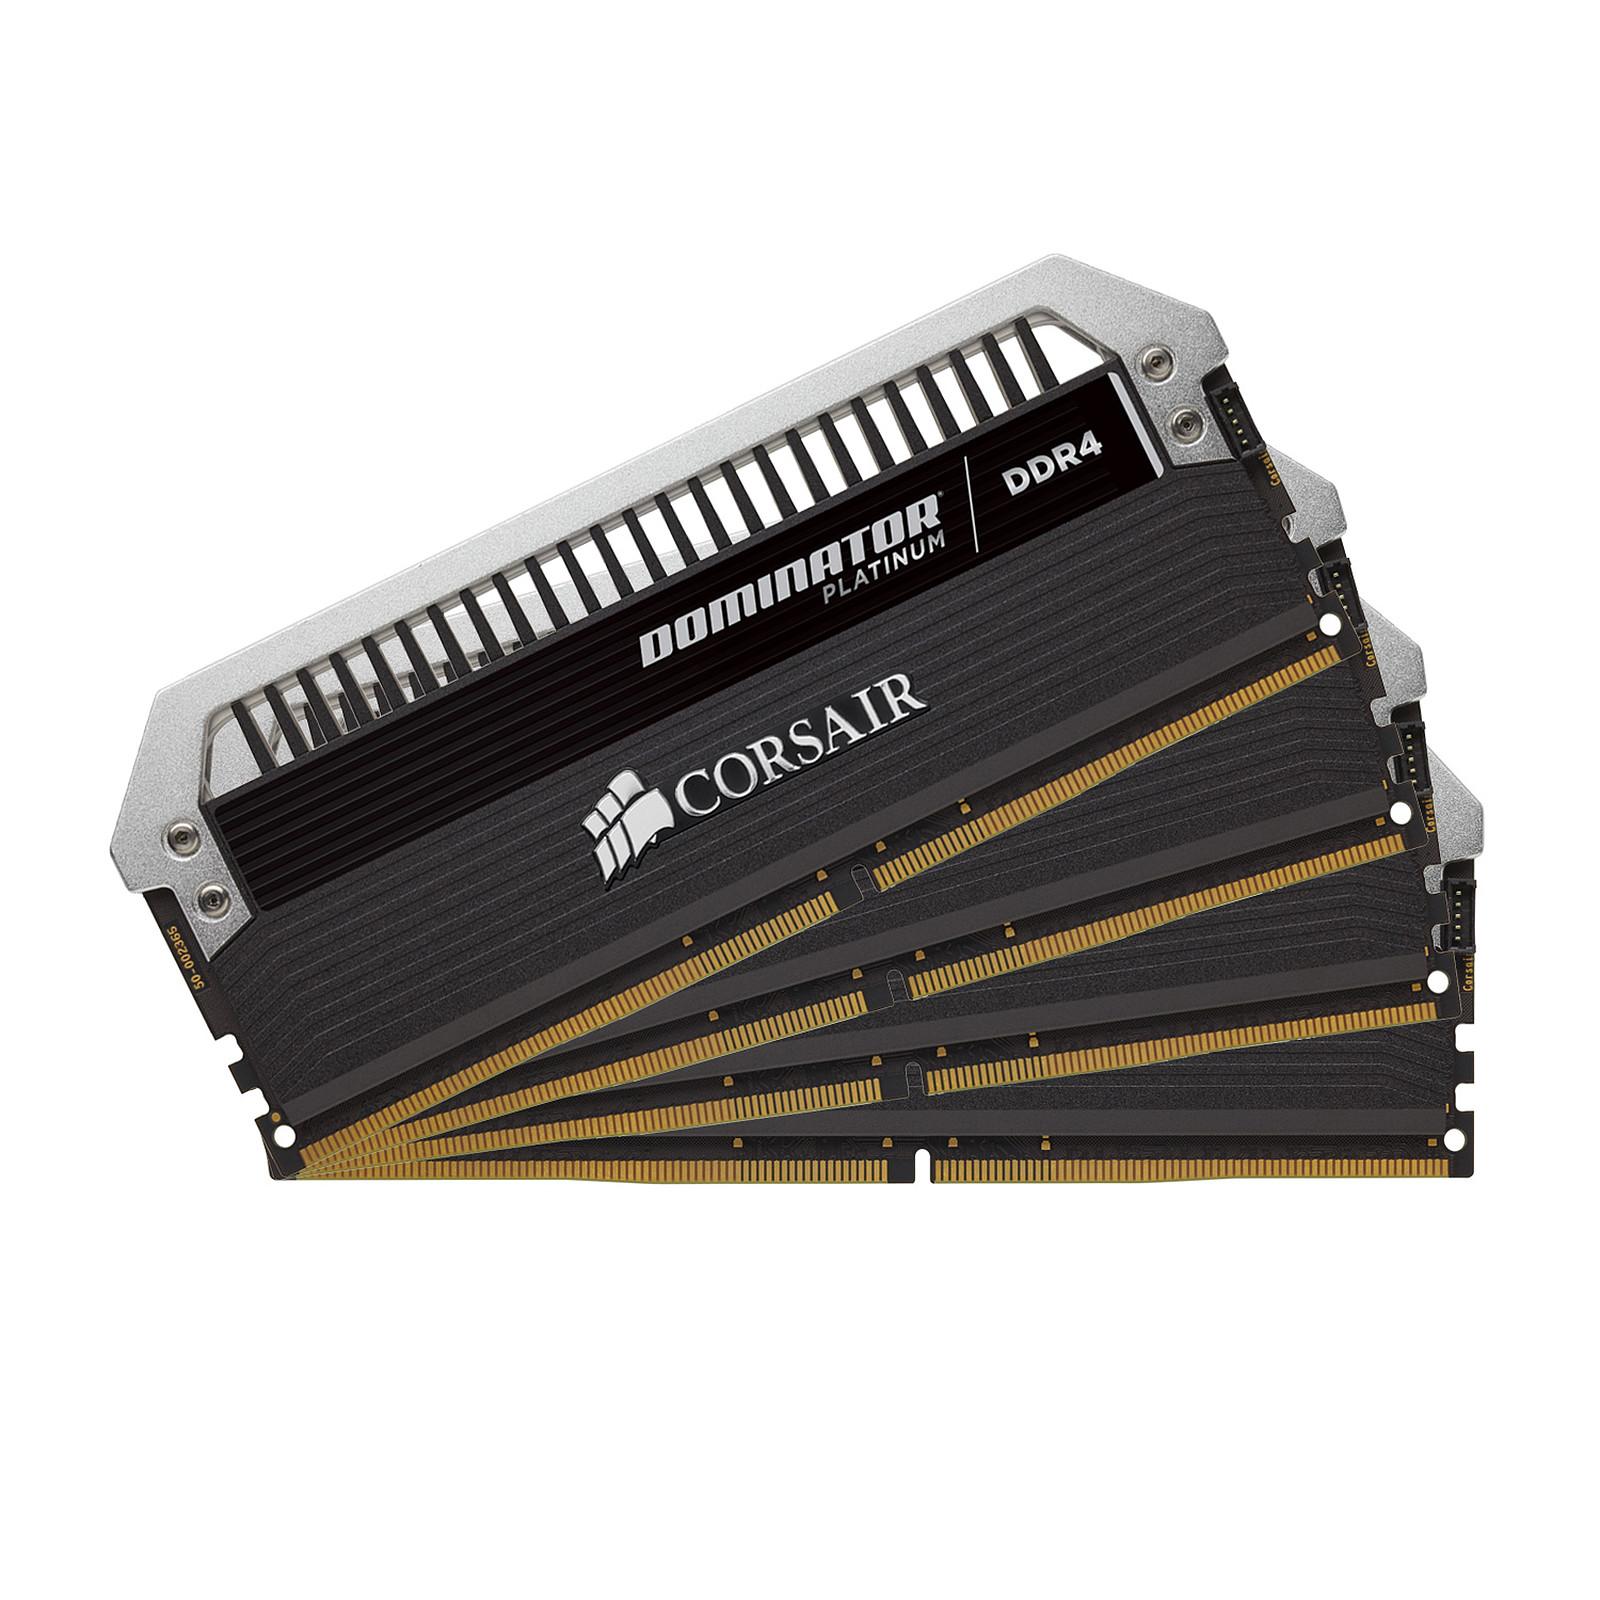 Corsair Dominator Platinum 64 Go (4x 16 Go) DDR4 3000 MHz CL15